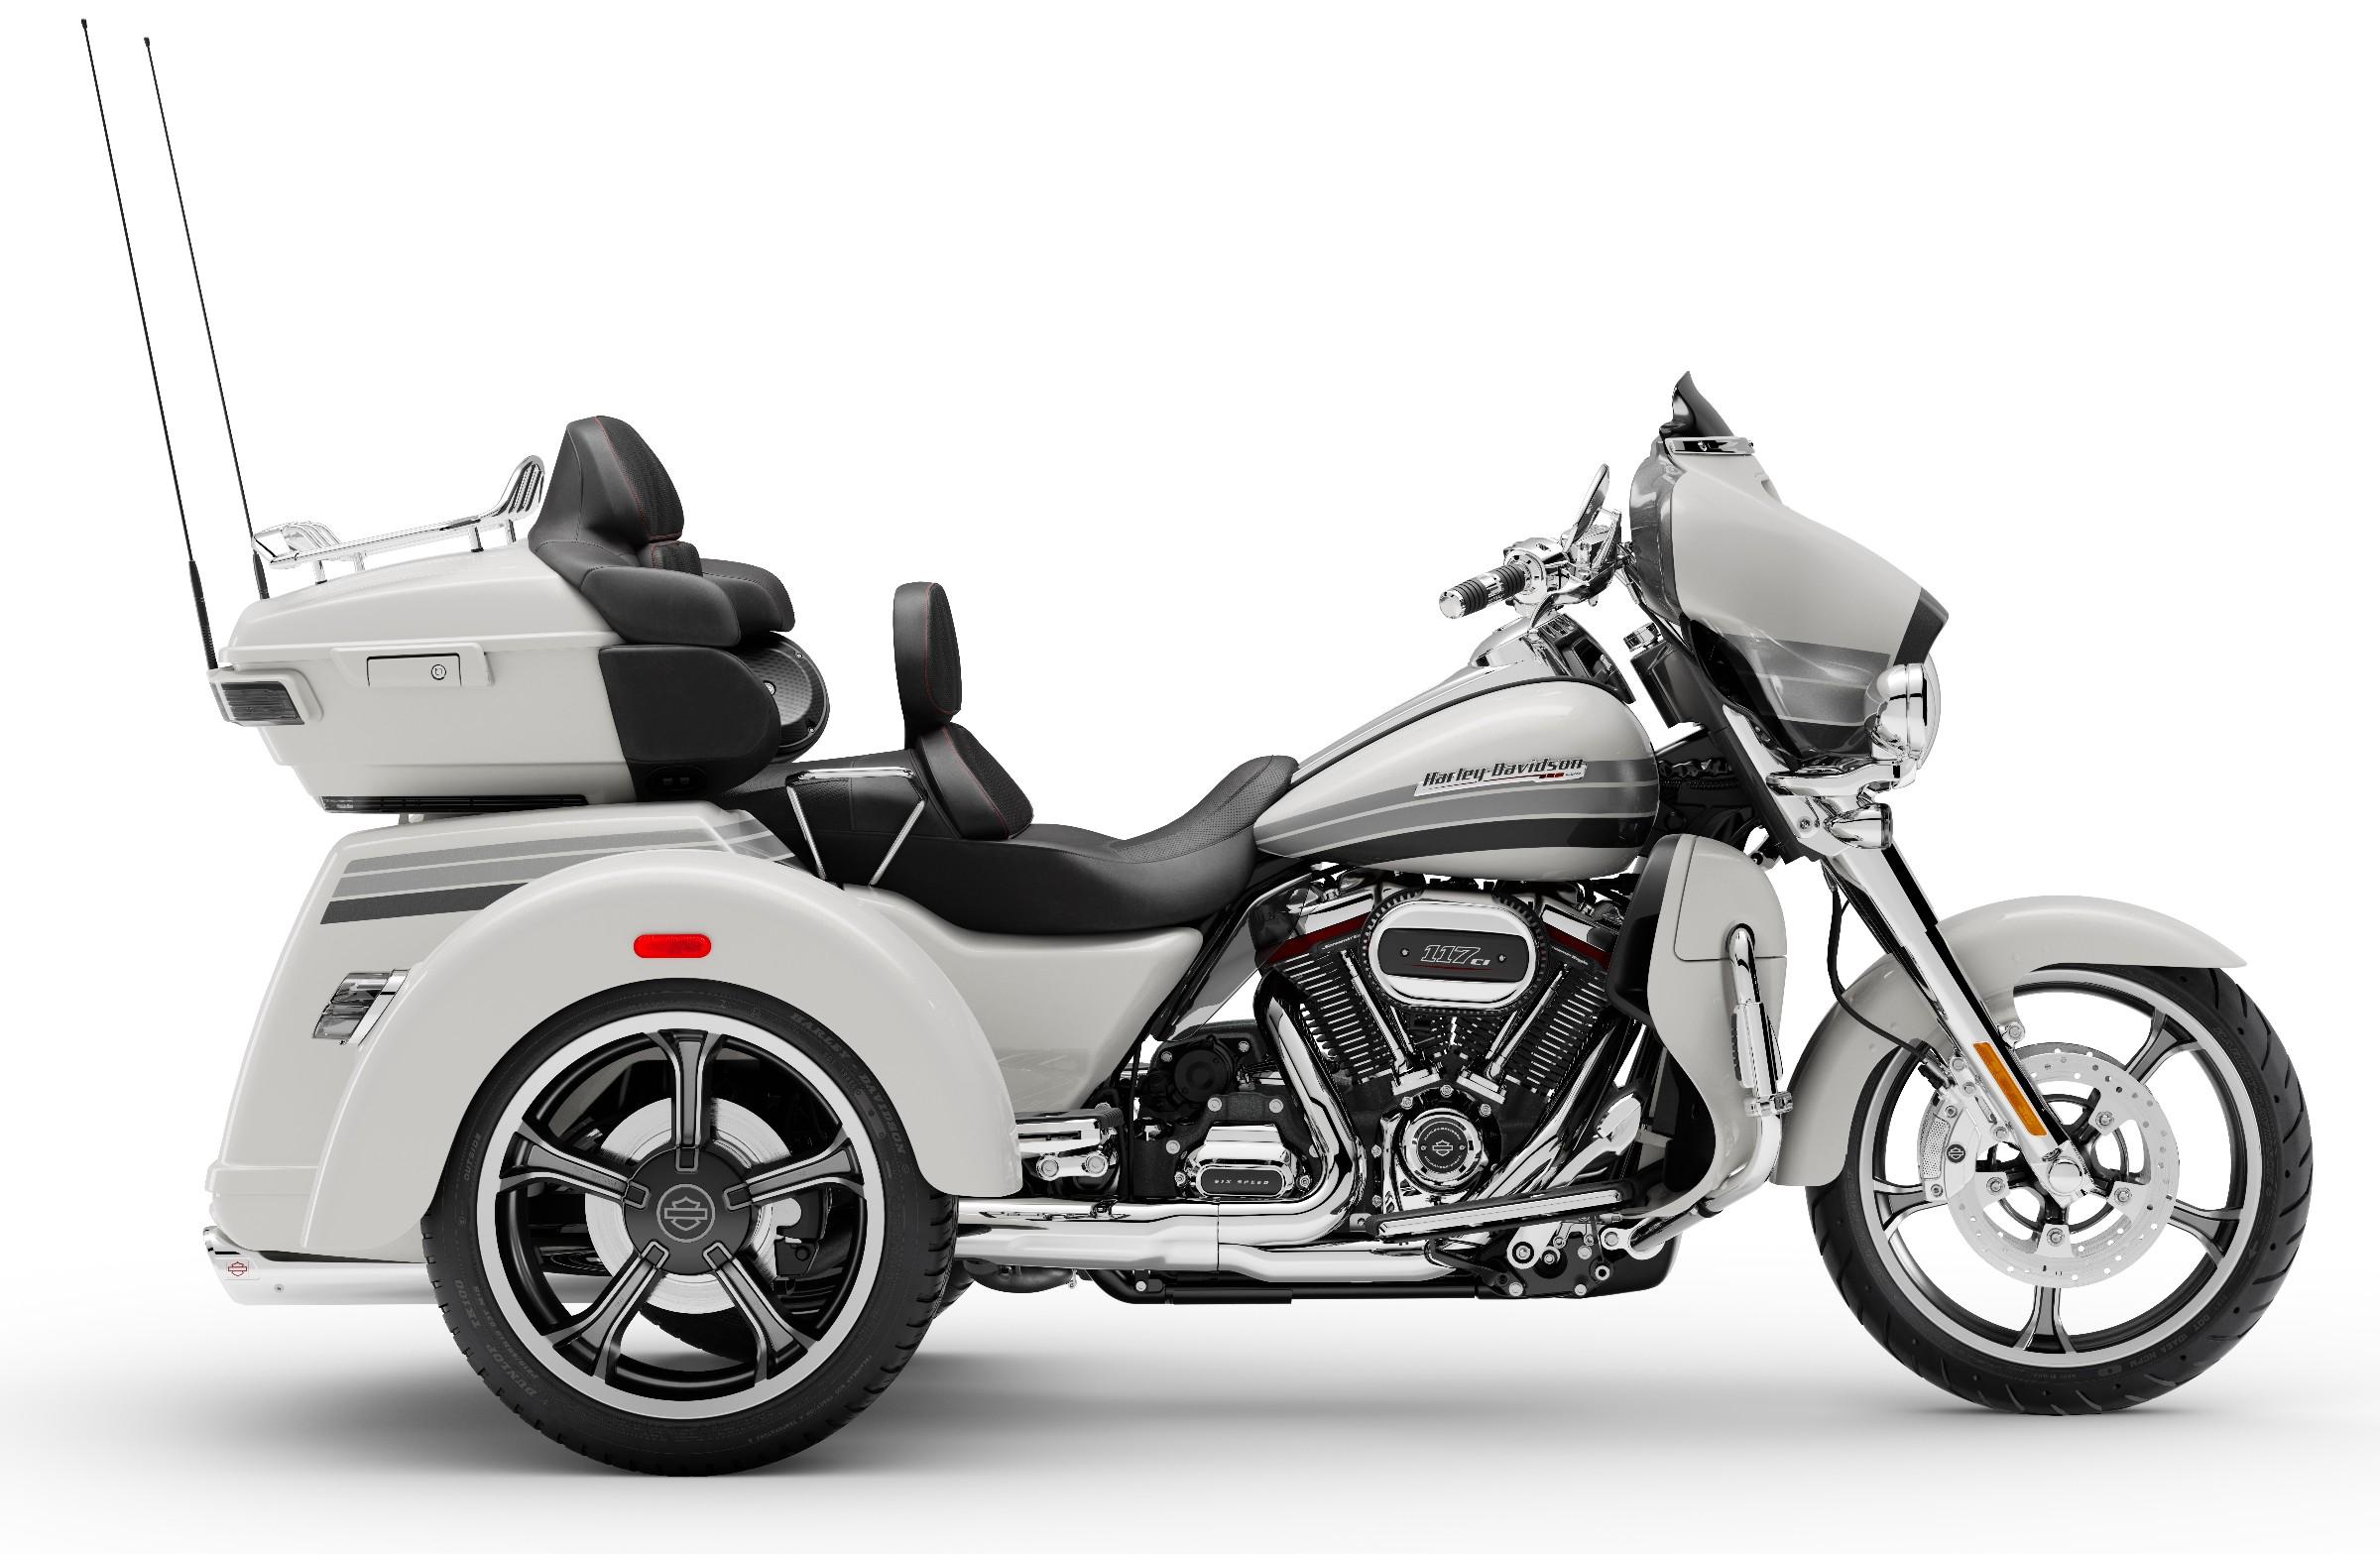 8 Best Harley Davidson Motorcycles of 2020